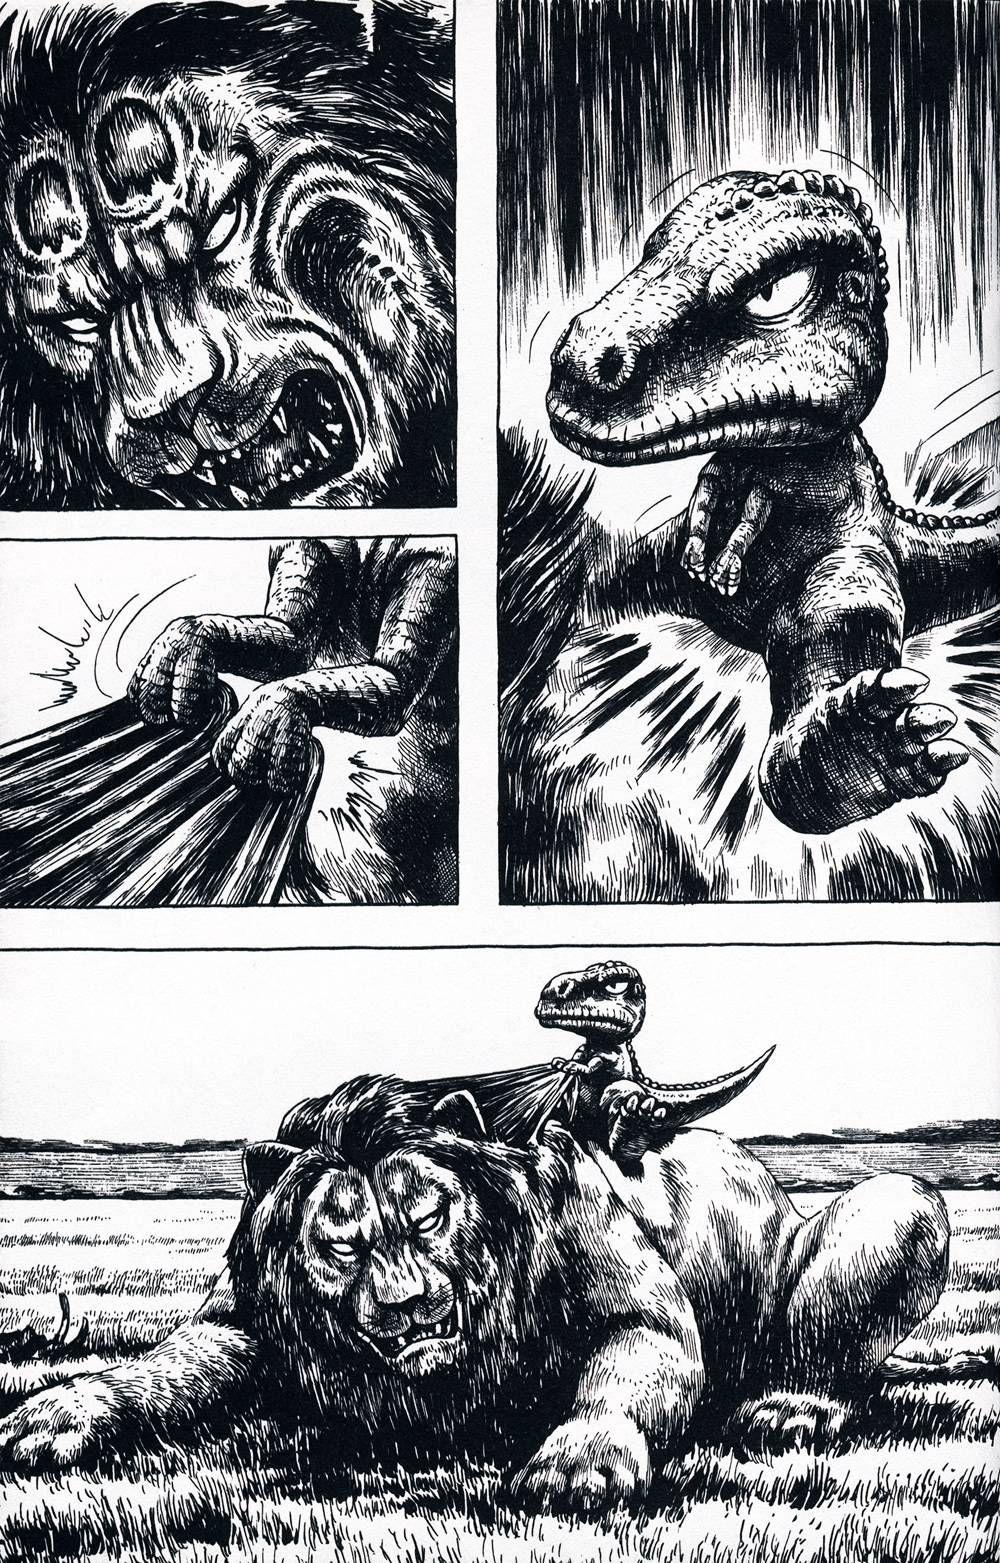 Gon The Little Dinosaur By Masashi Tanaka Terrorising Pretty Much